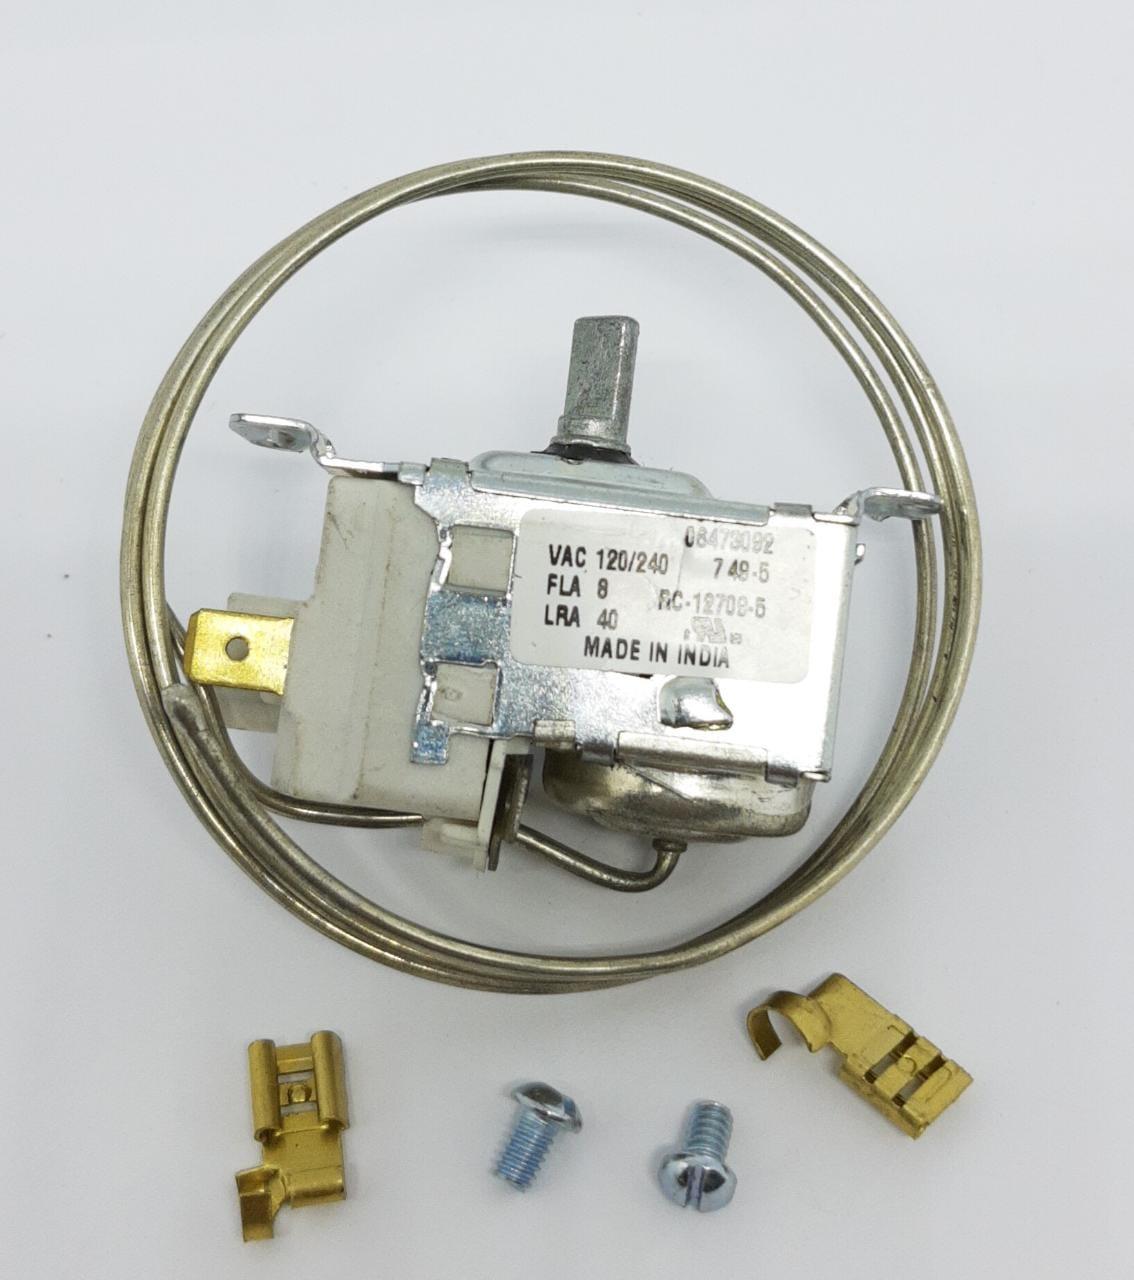 Termostato Electrolux R26 Rc12709-5p